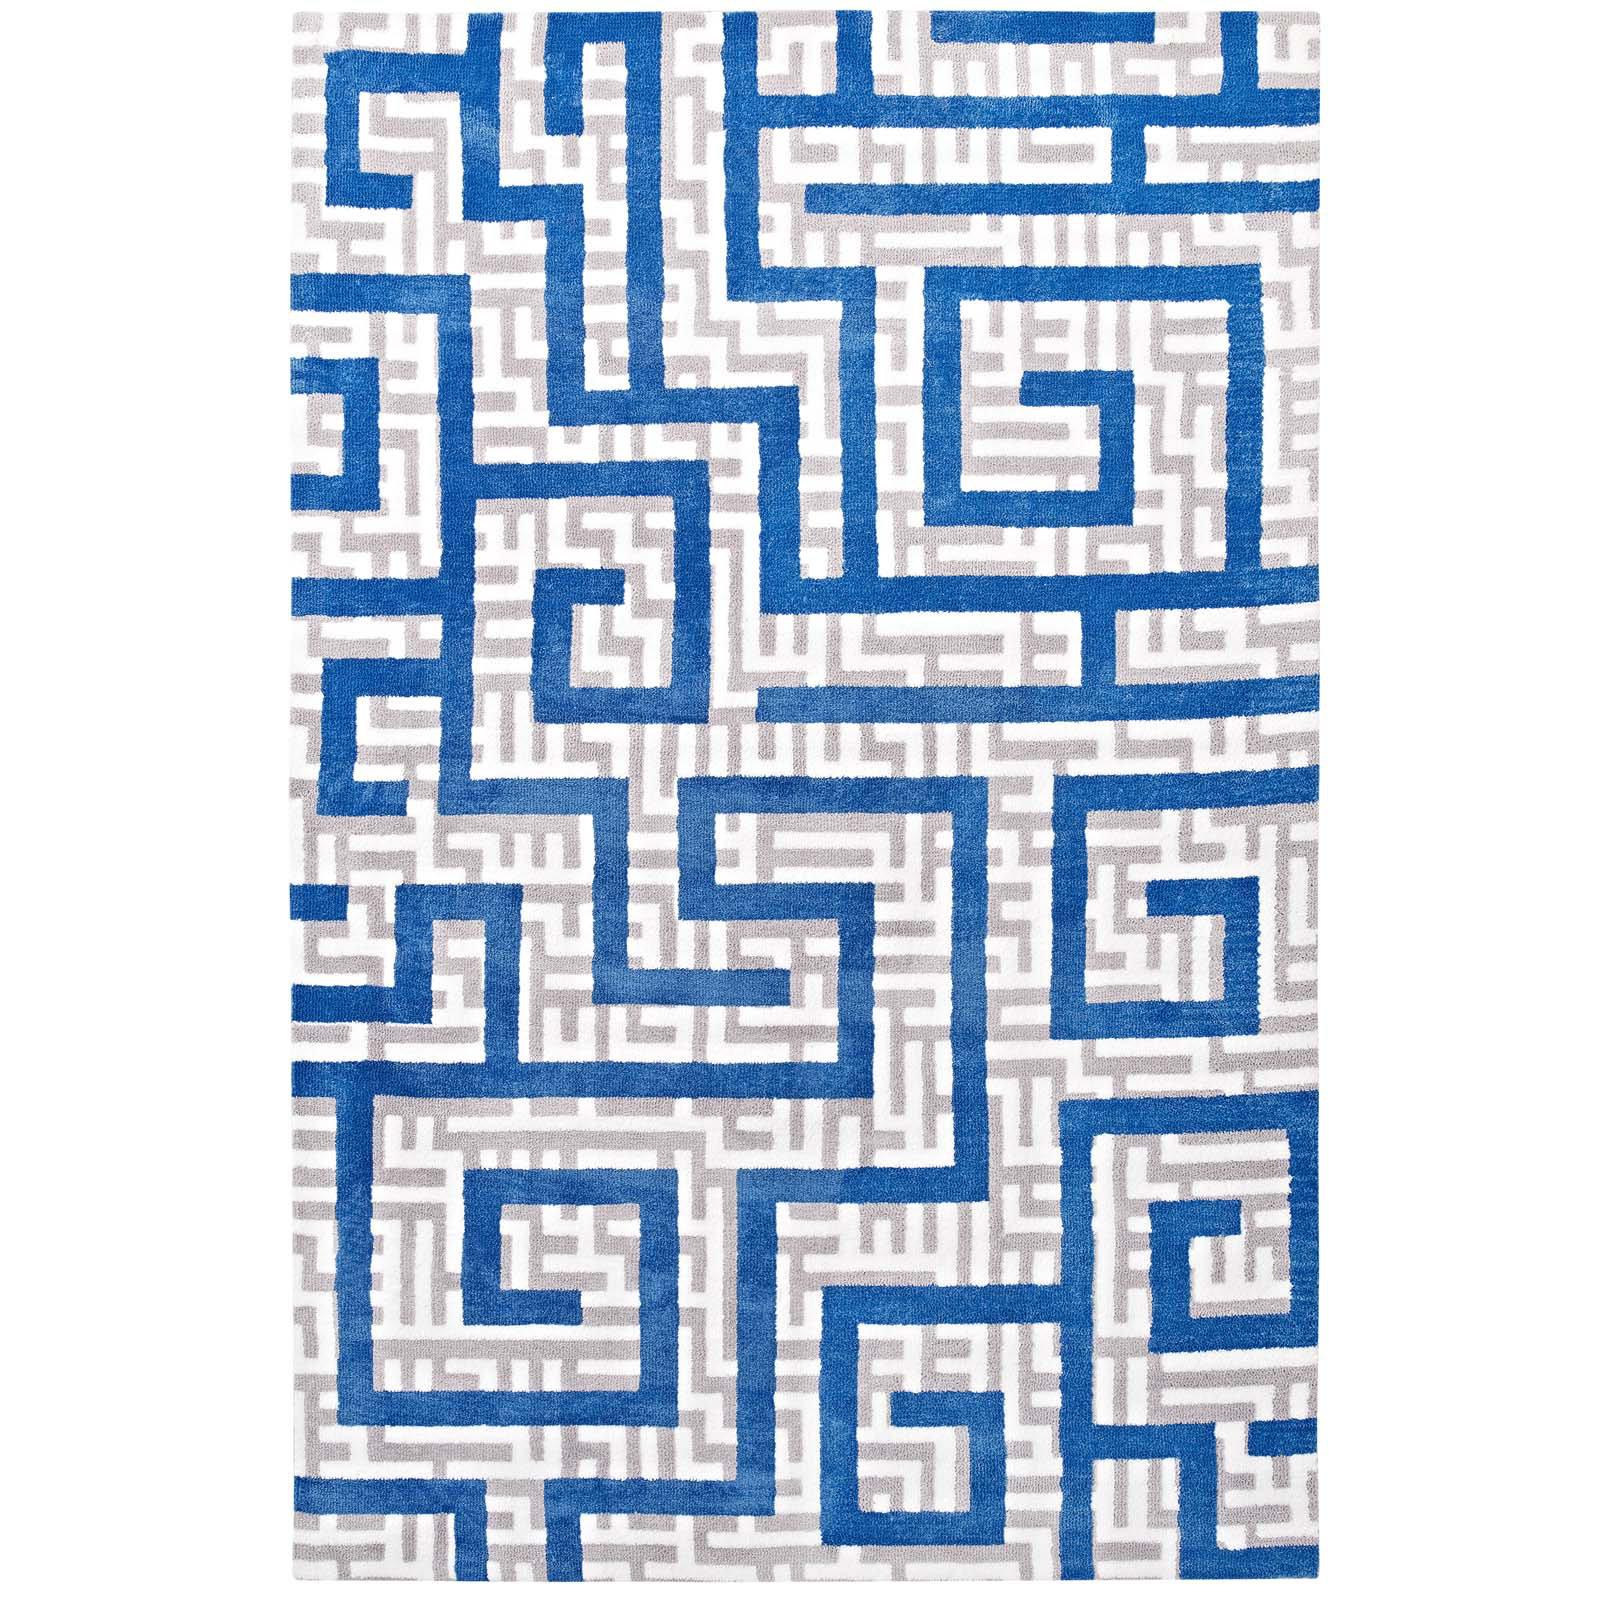 Mercer41 Selvage Geometric Maze Ivory/Light Gray/Blue Area Rug | Wayfair